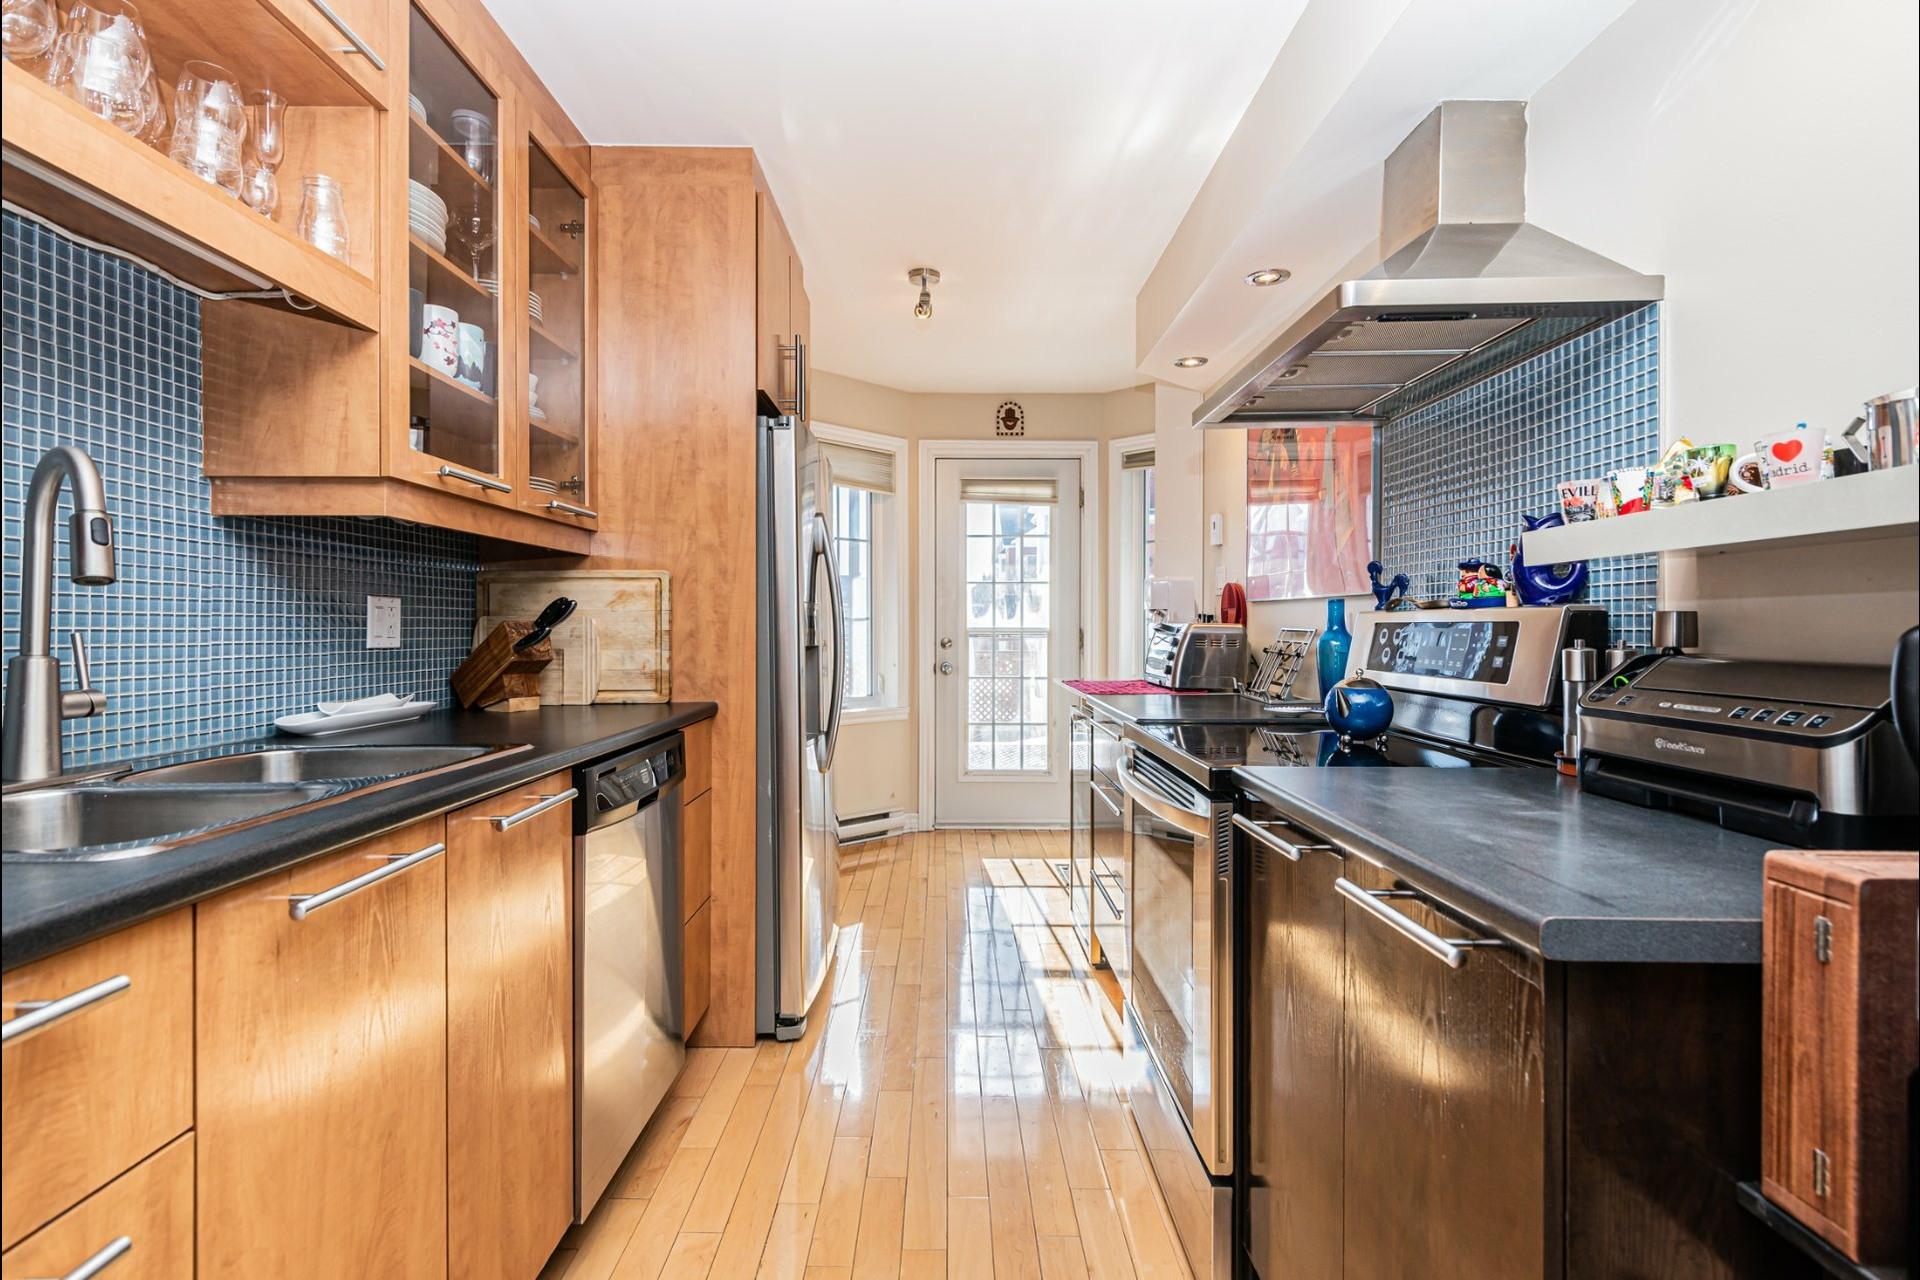 image 6 - Departamento En venta Saint-Laurent Montréal  - 4 habitaciones